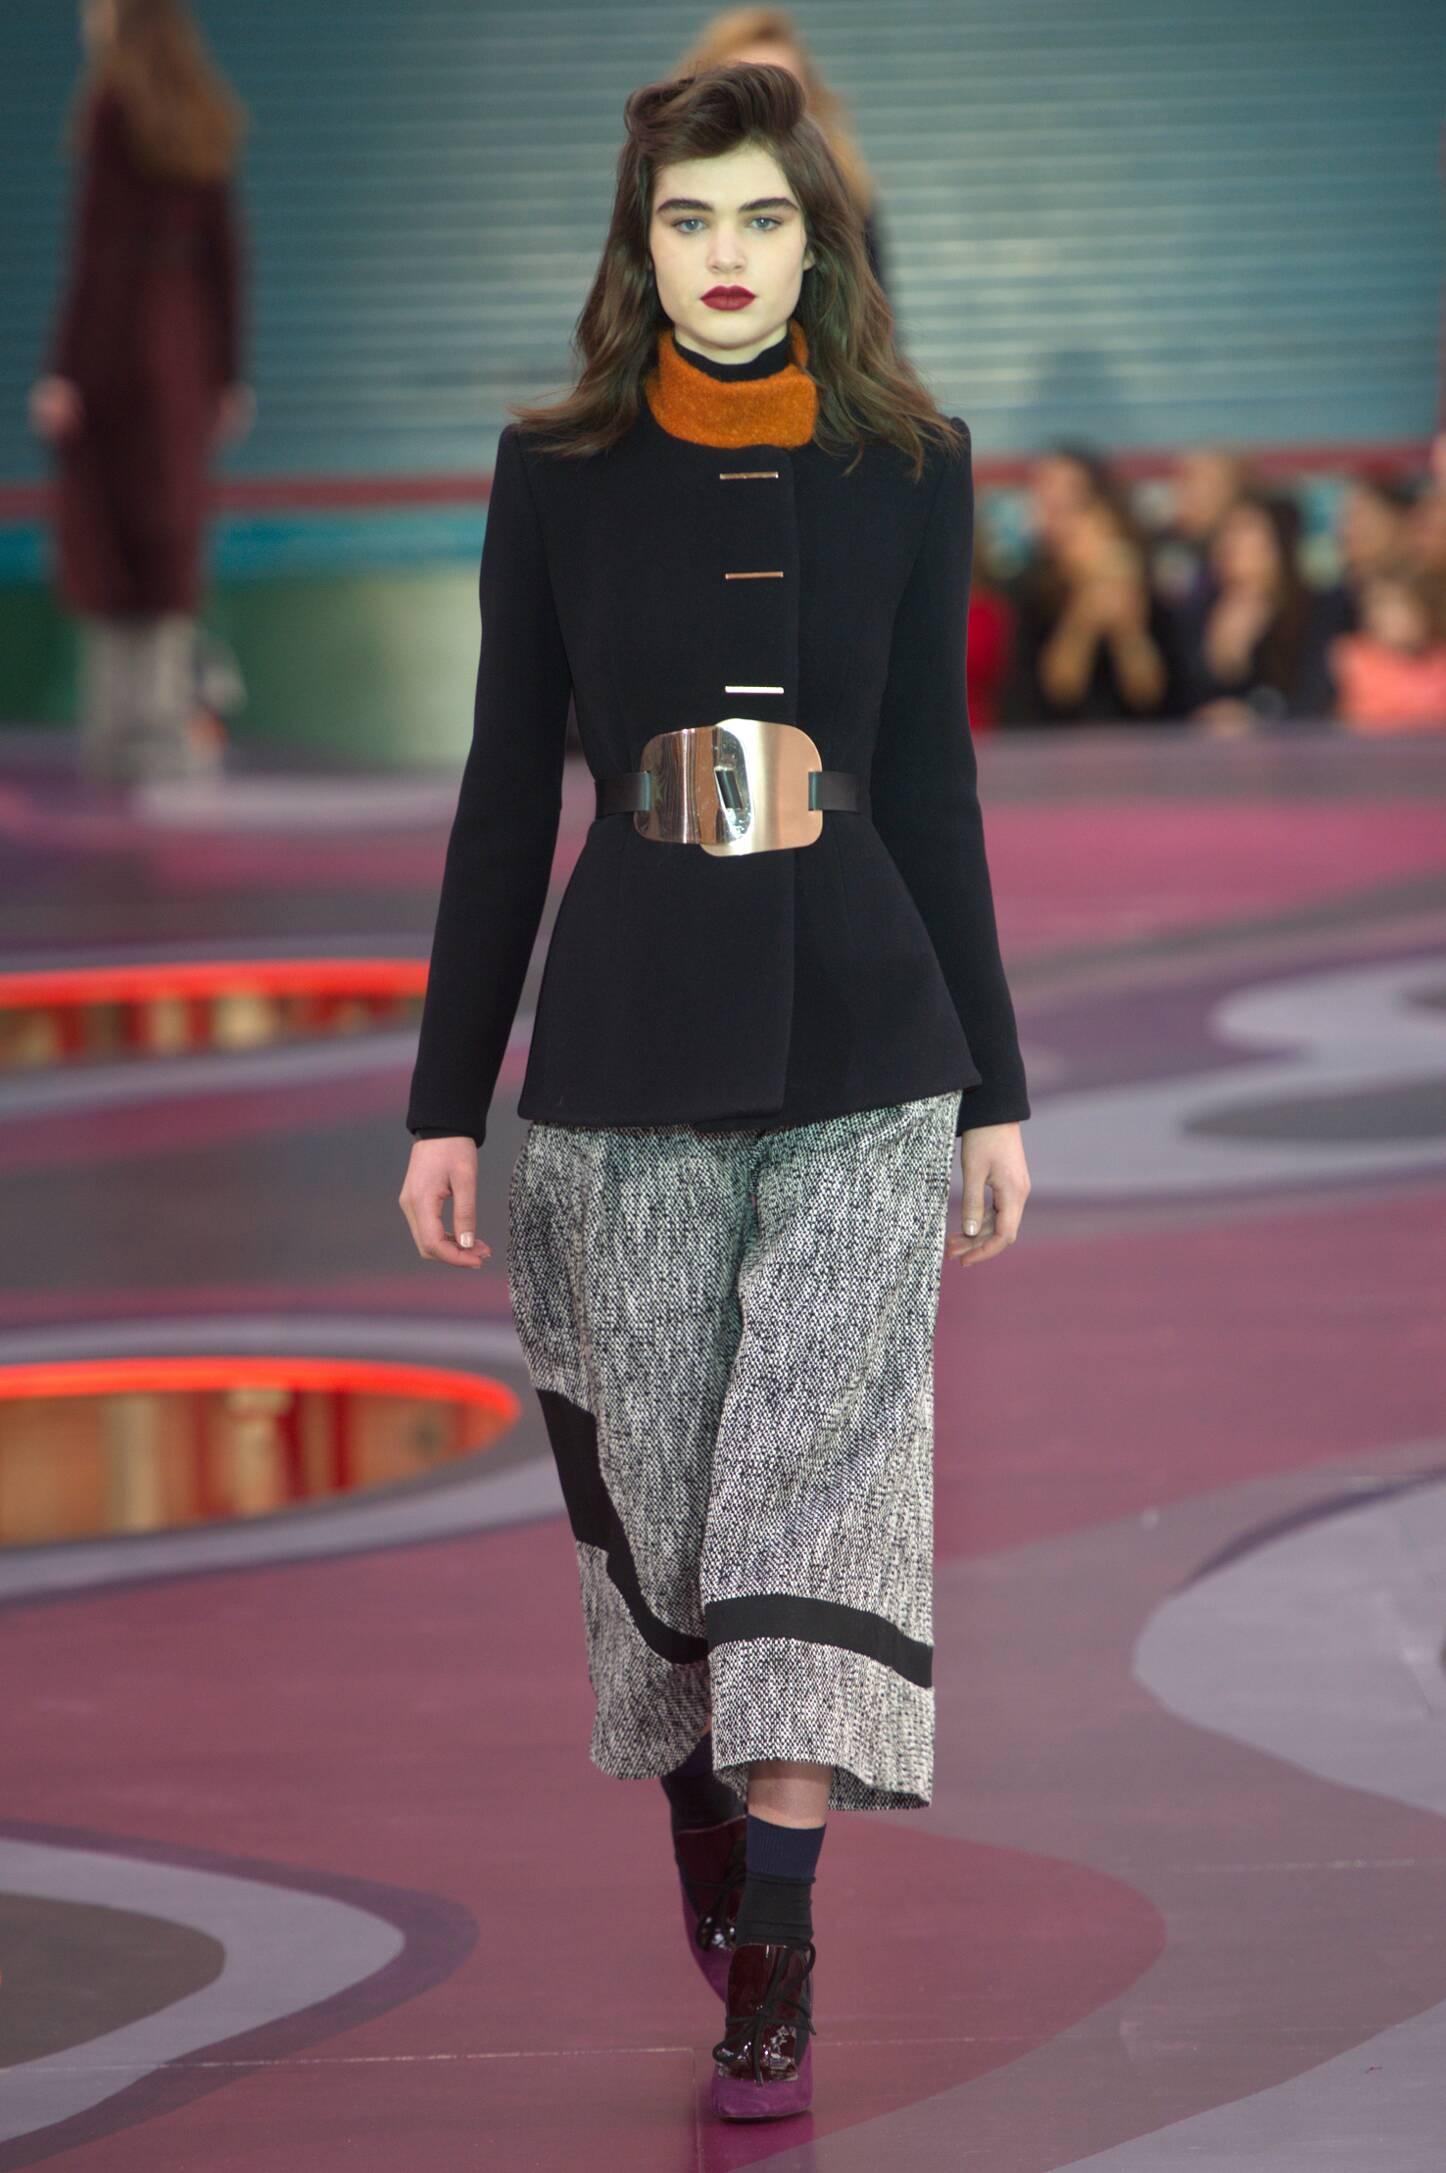 Runway Roksanda Fall Winter 2015 16 Women's Collection London Fashion Week